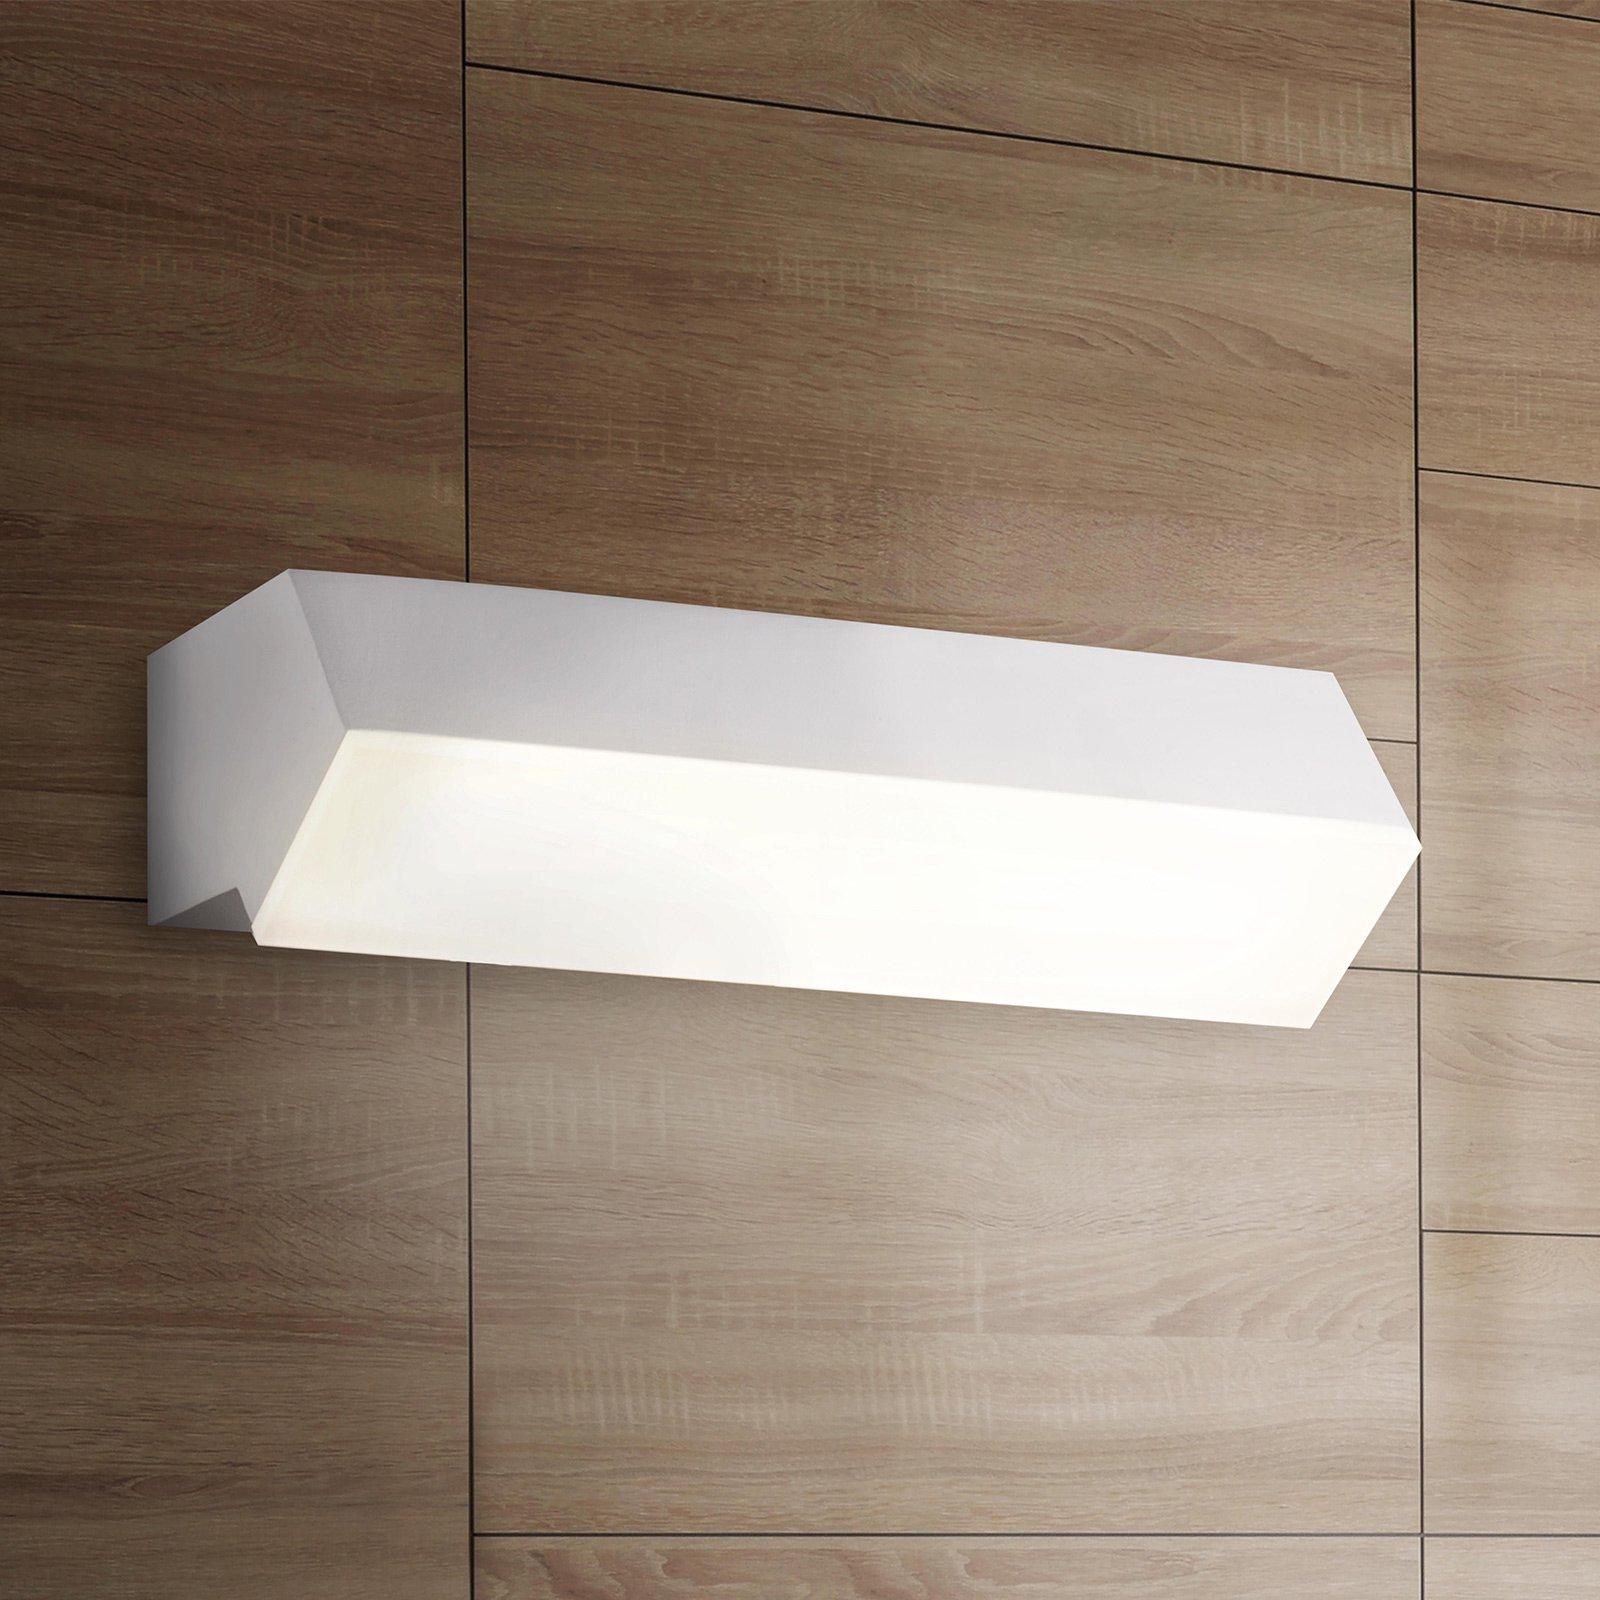 Toni LED-vegglampe, bredde 20,5 cm